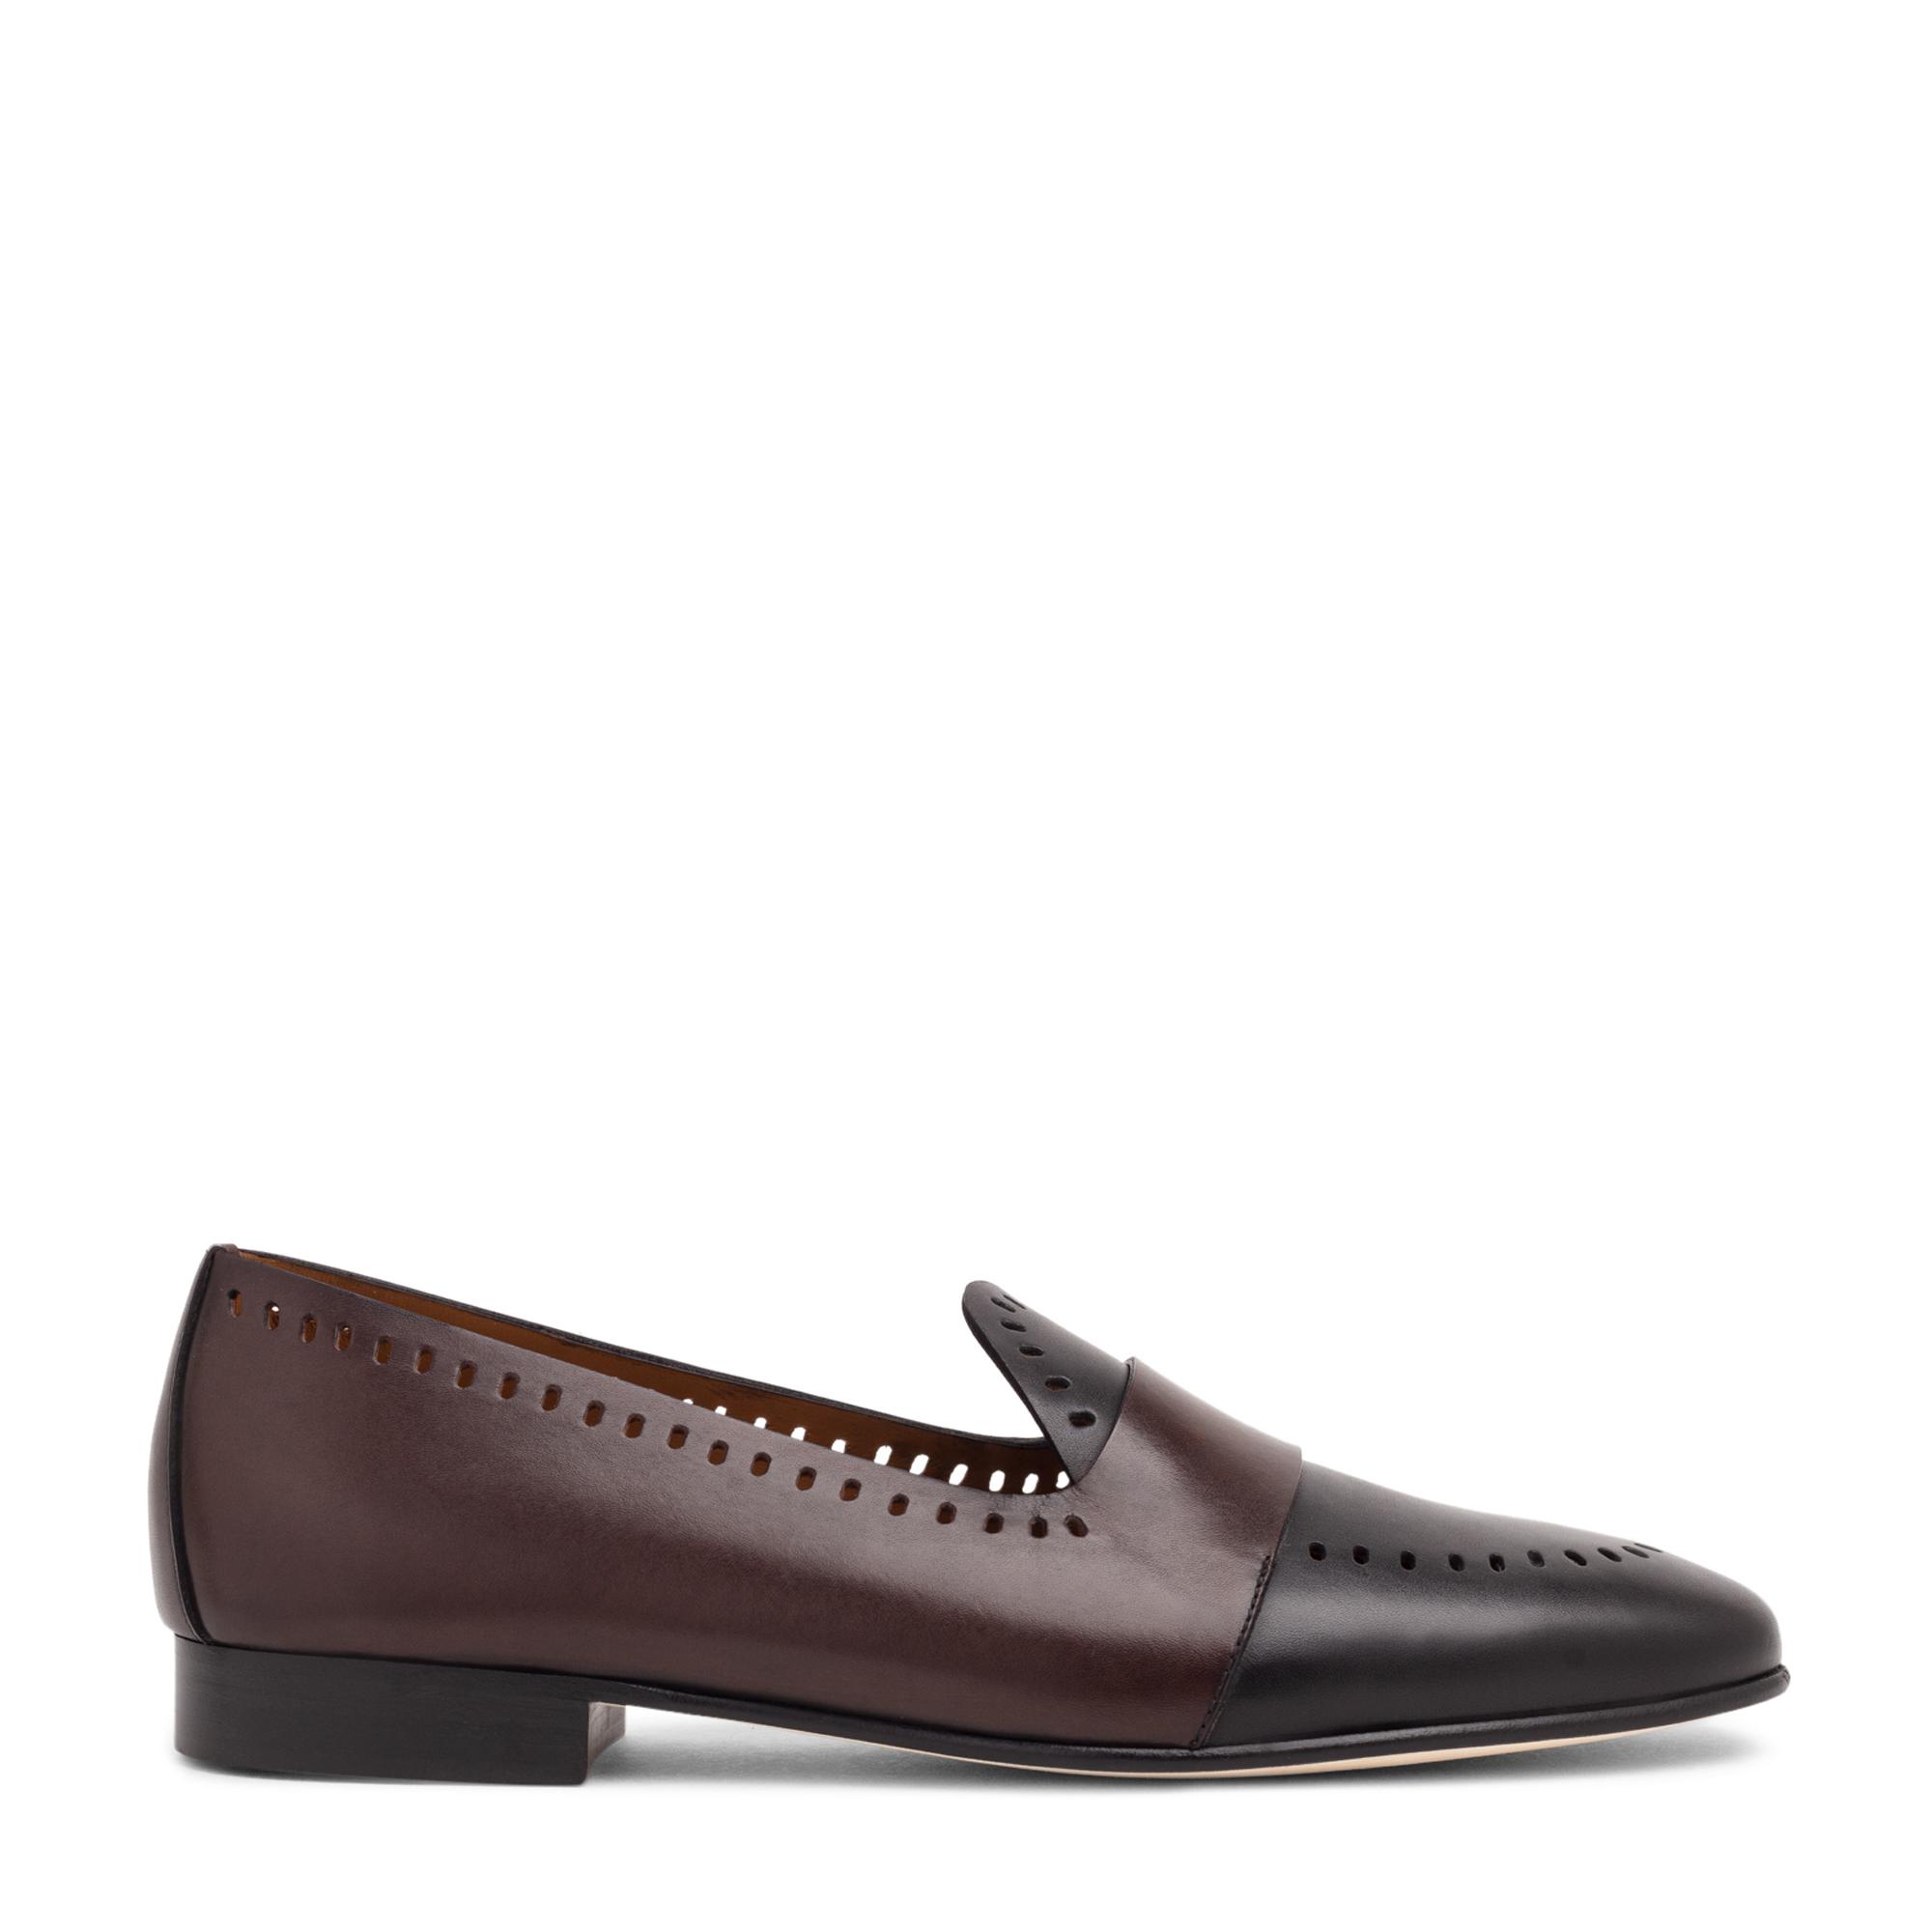 Hamptons loafers